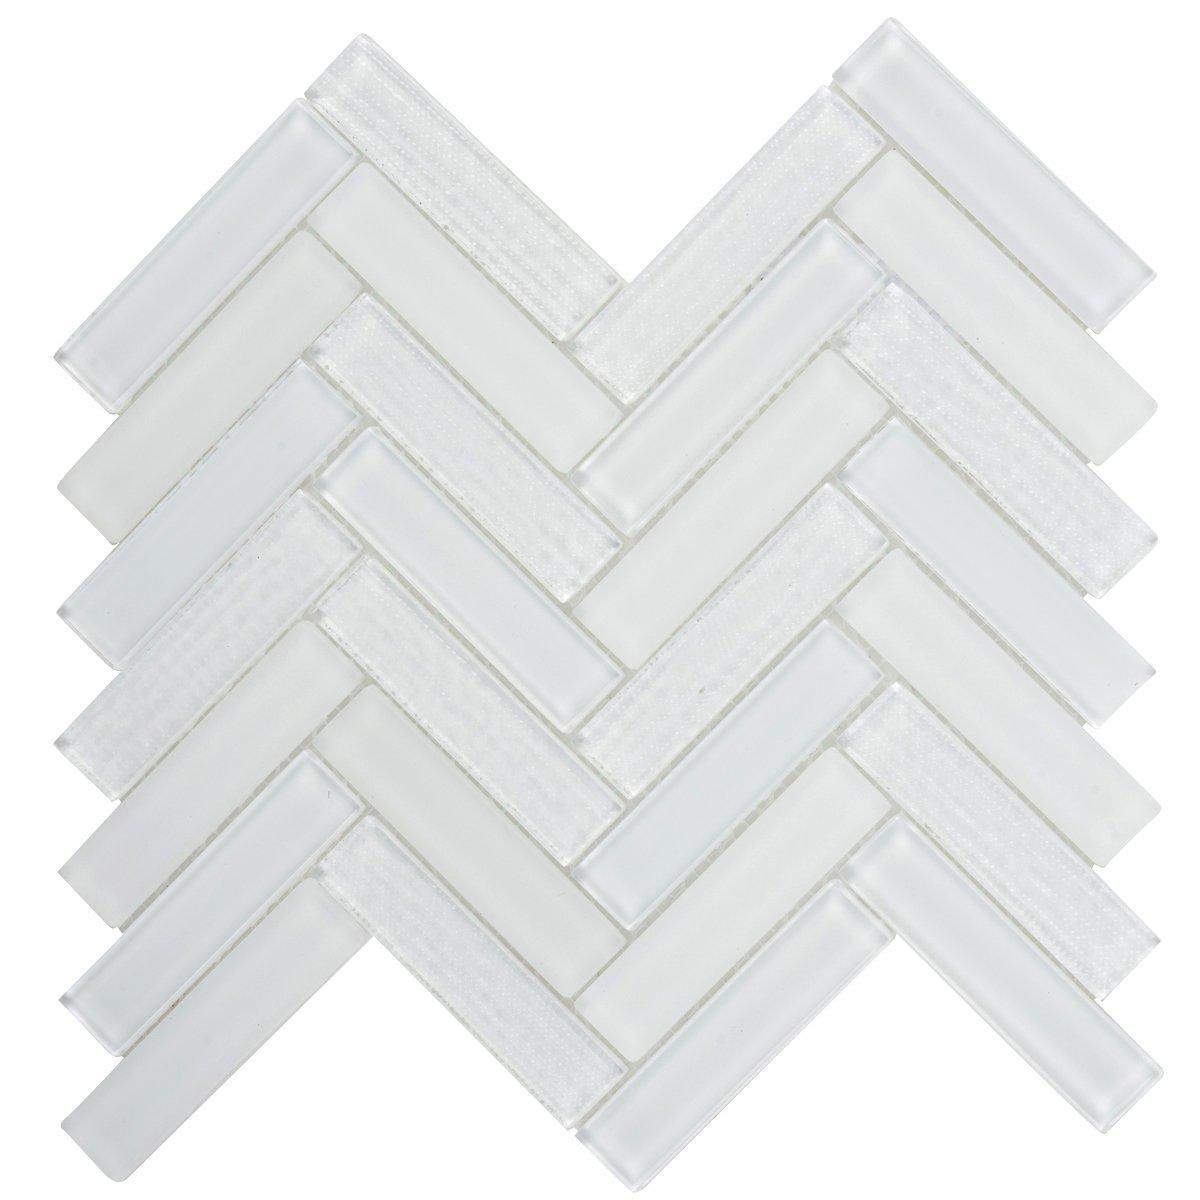 Modket TDH89MO Super White Crystal Glass Mosaic Tile, Texture, Matte Blend Herringbone Pattern Backsplash